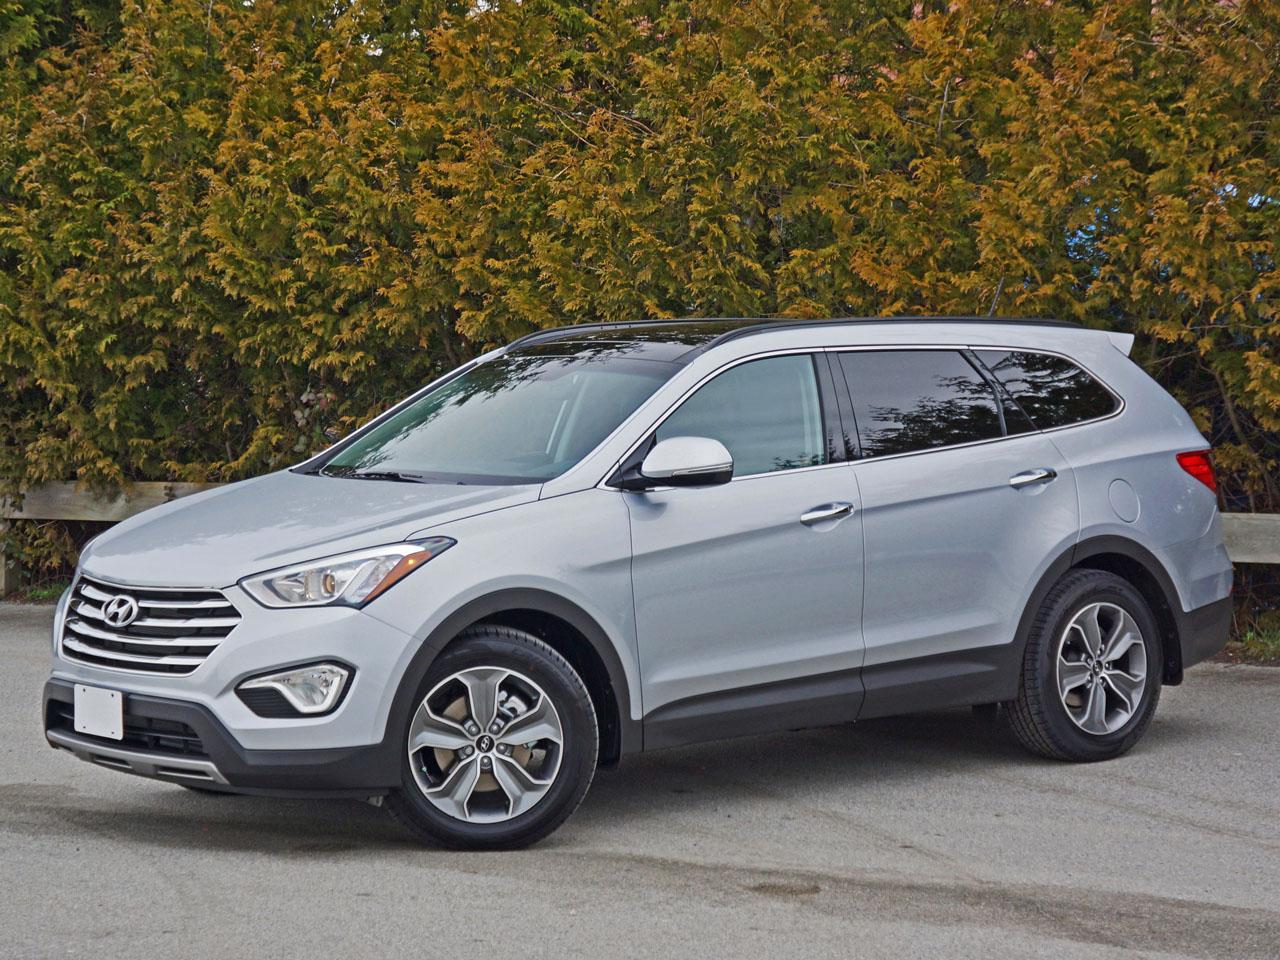 santa autotrader day fe xl hyundai sale cars price santafexl for jb ca review by